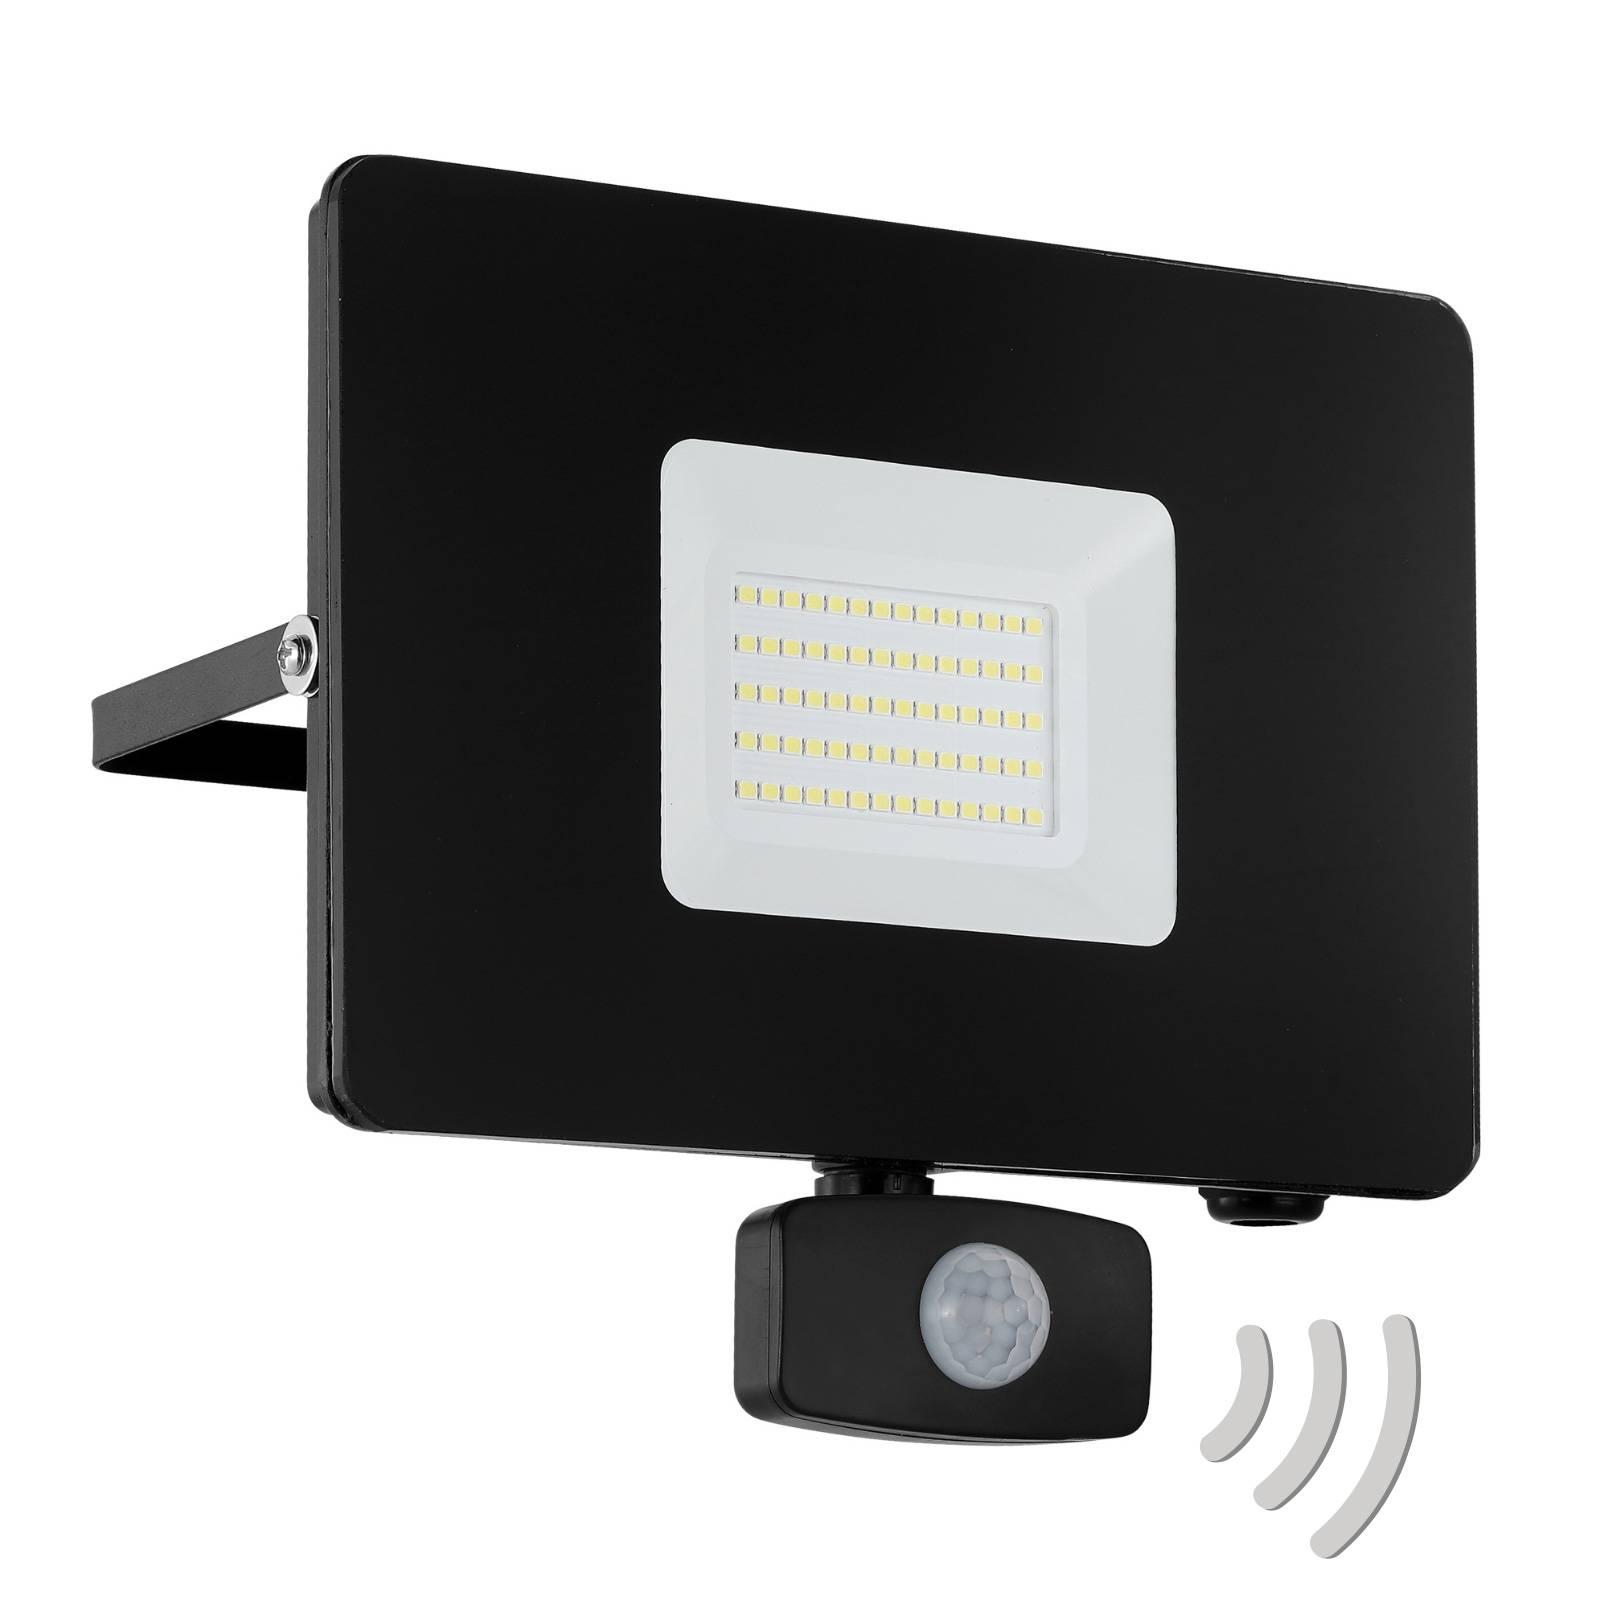 LED buitenspot Faedo 3 met sensor, zwart, 50W